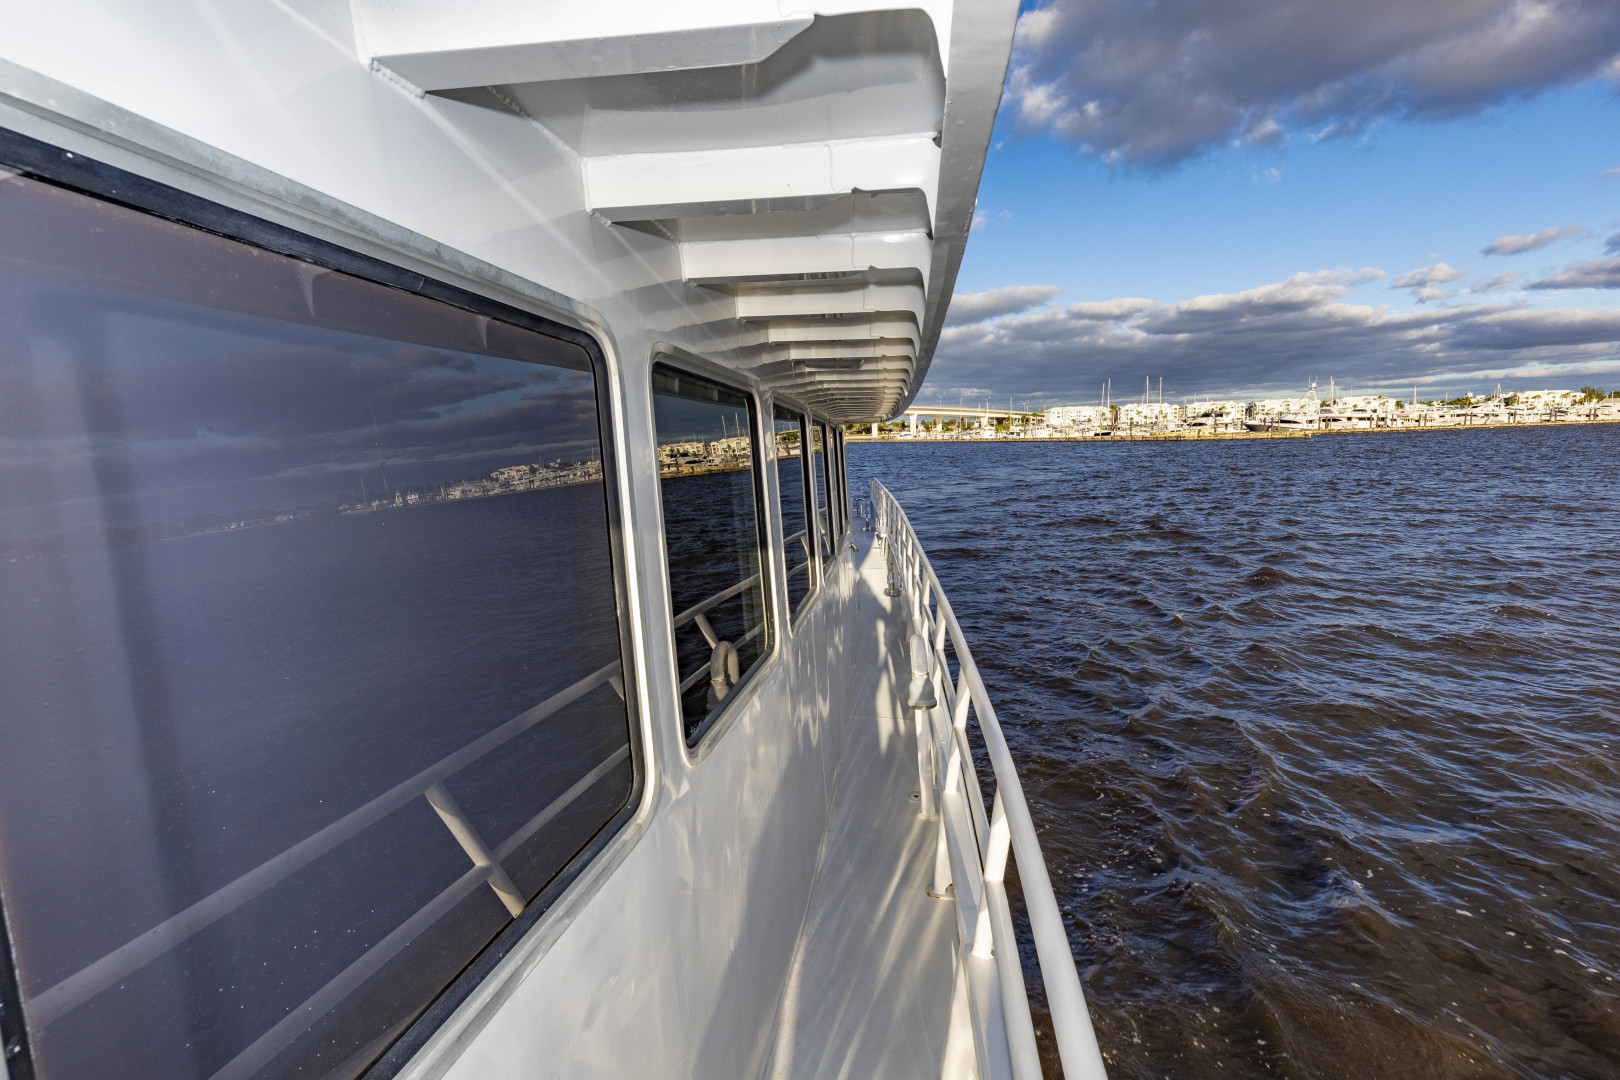 GlassTech-Expedition Yacht 2018-Reset Stuart-Florida-United States-Sidedeck-1568633 | Thumbnail